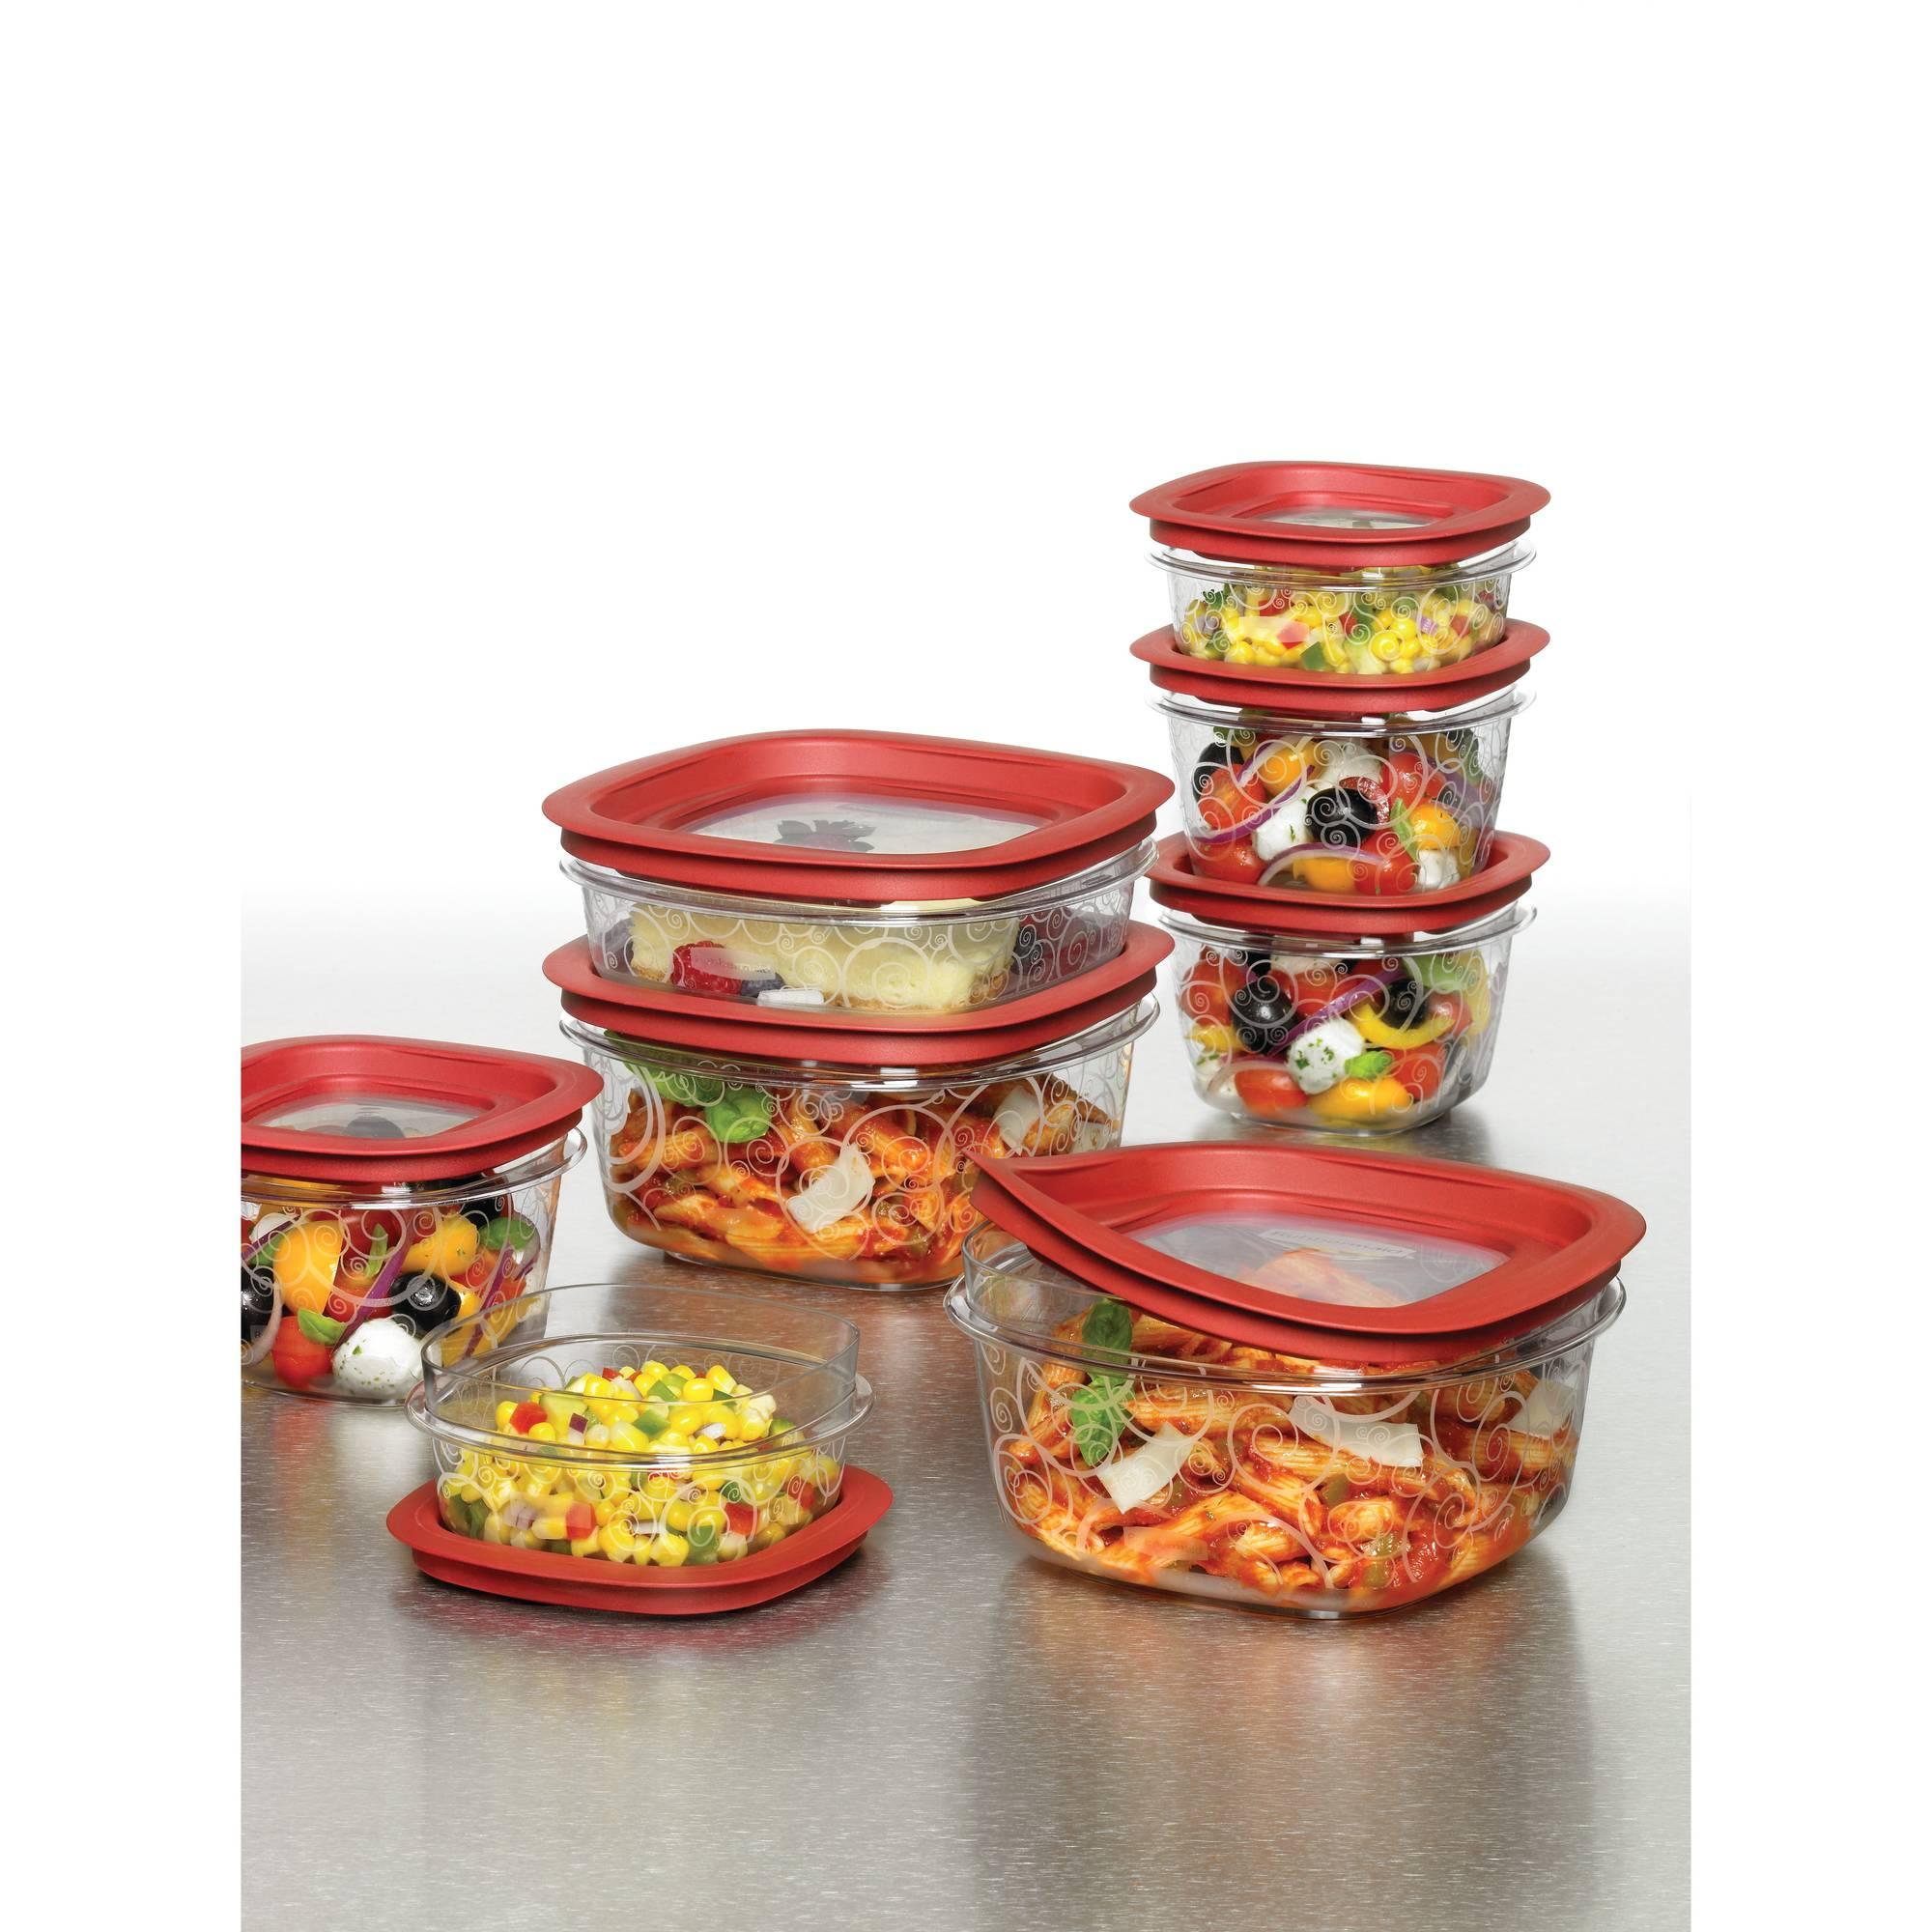 Rubbermaid 16-Piece Premier Food Storage Set